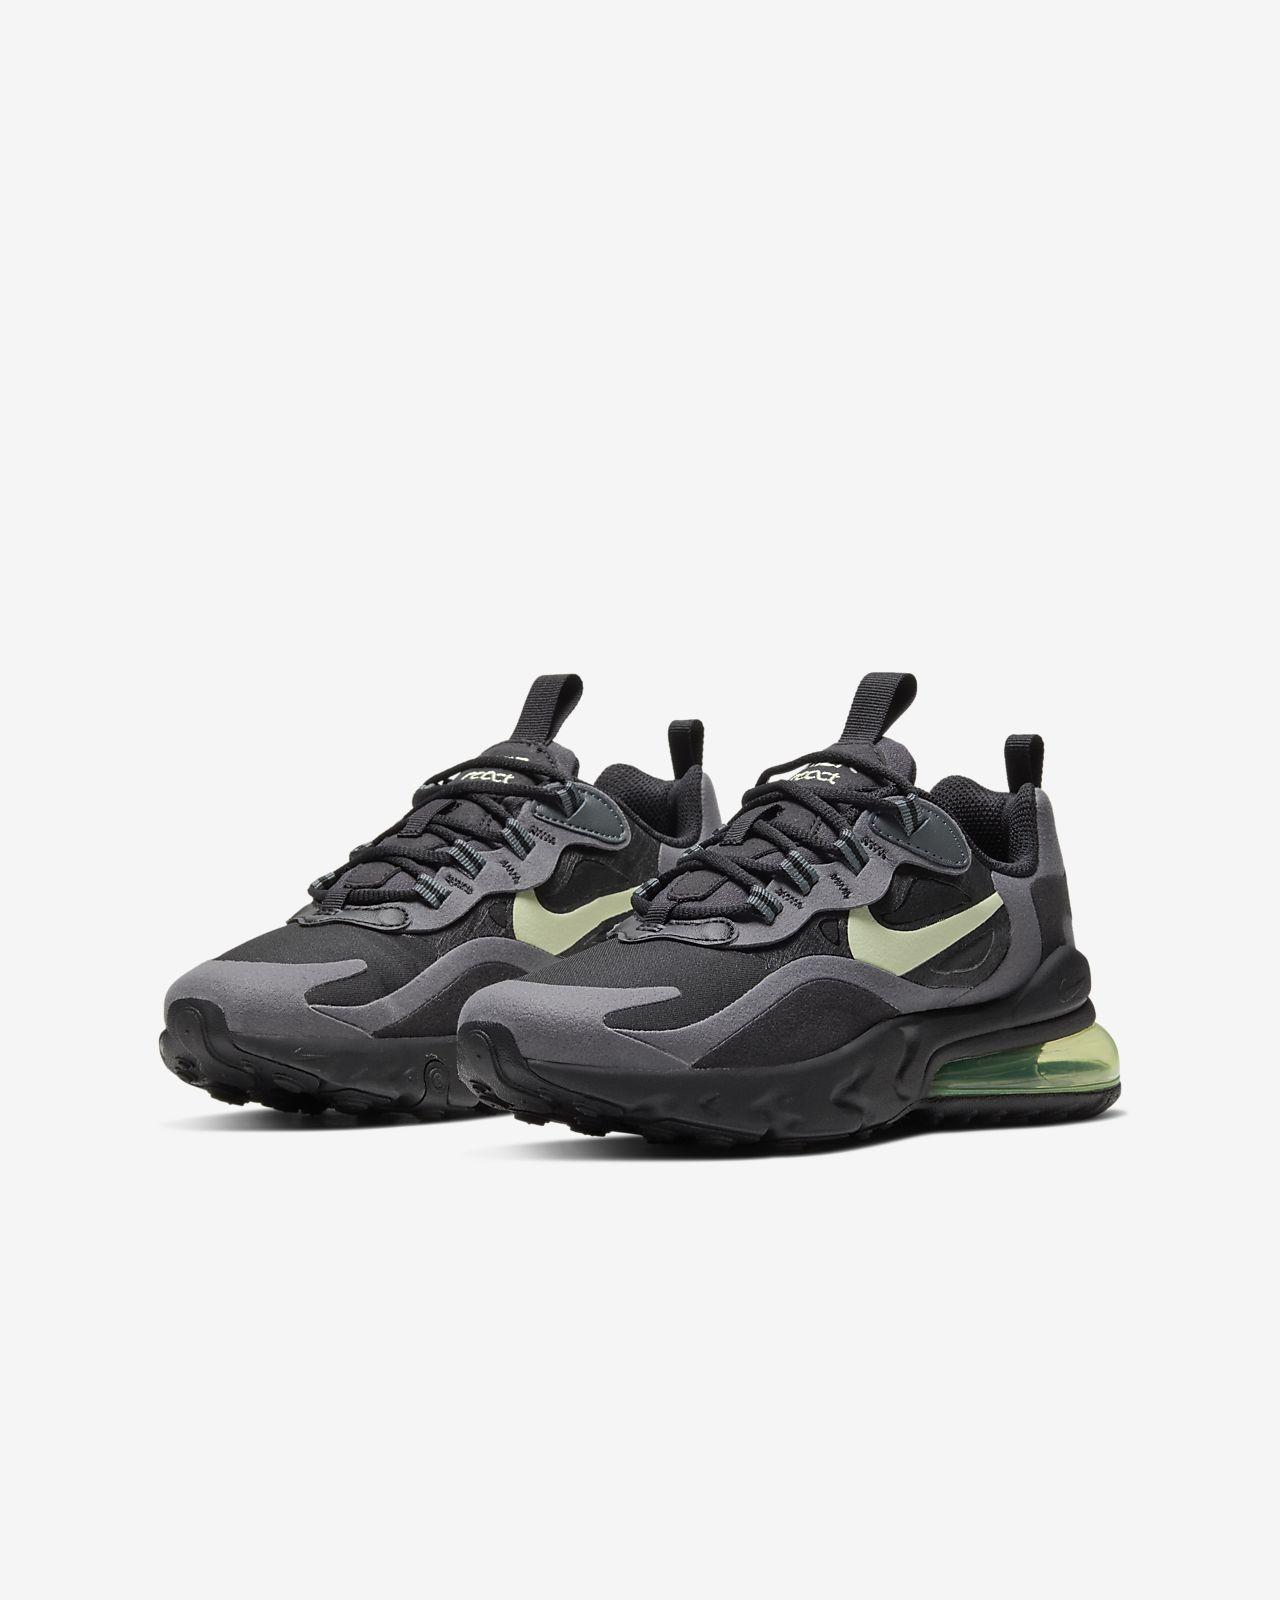 Older Kids' Air Shoe Nike React Max 270 N8wnvOm0